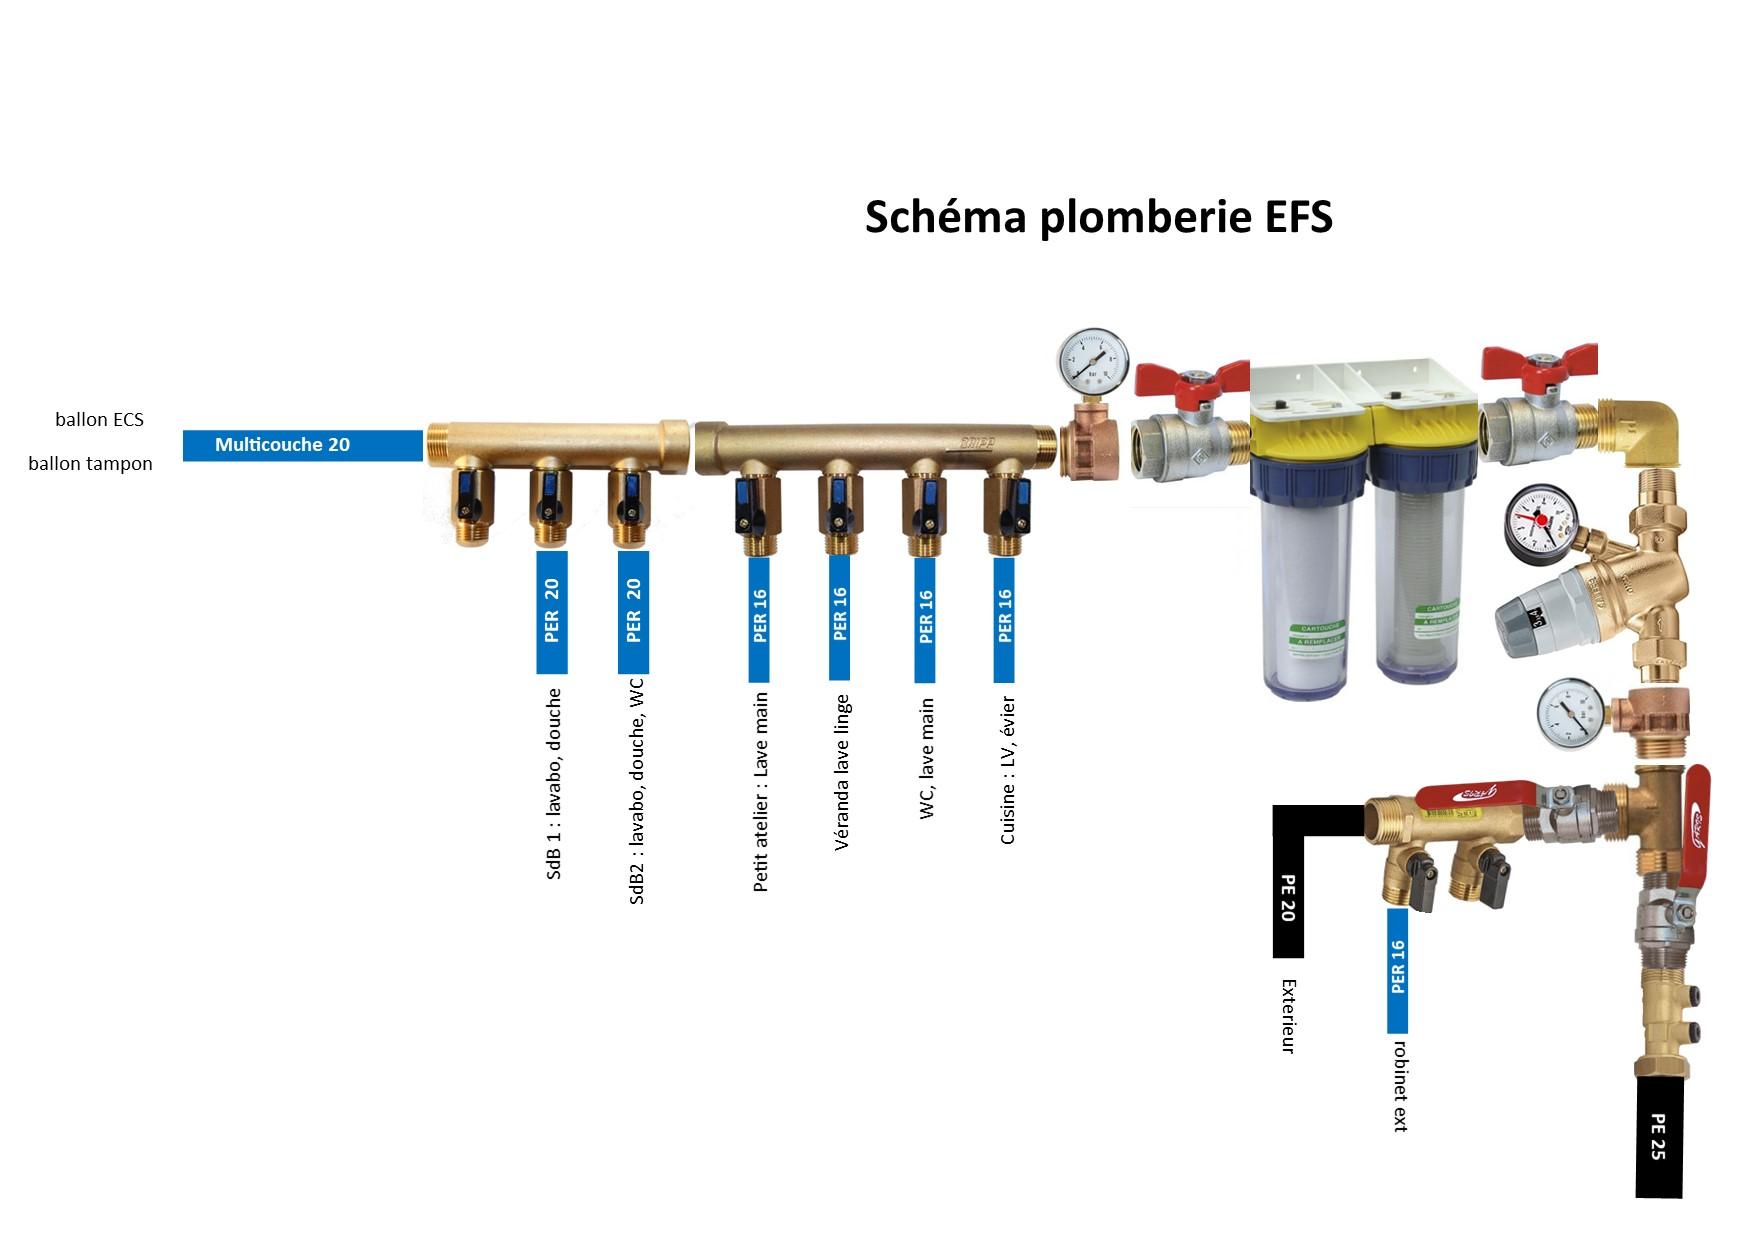 Schéma plomberie EFSv2.jpg, 166.93 kb, 1754 x 1240